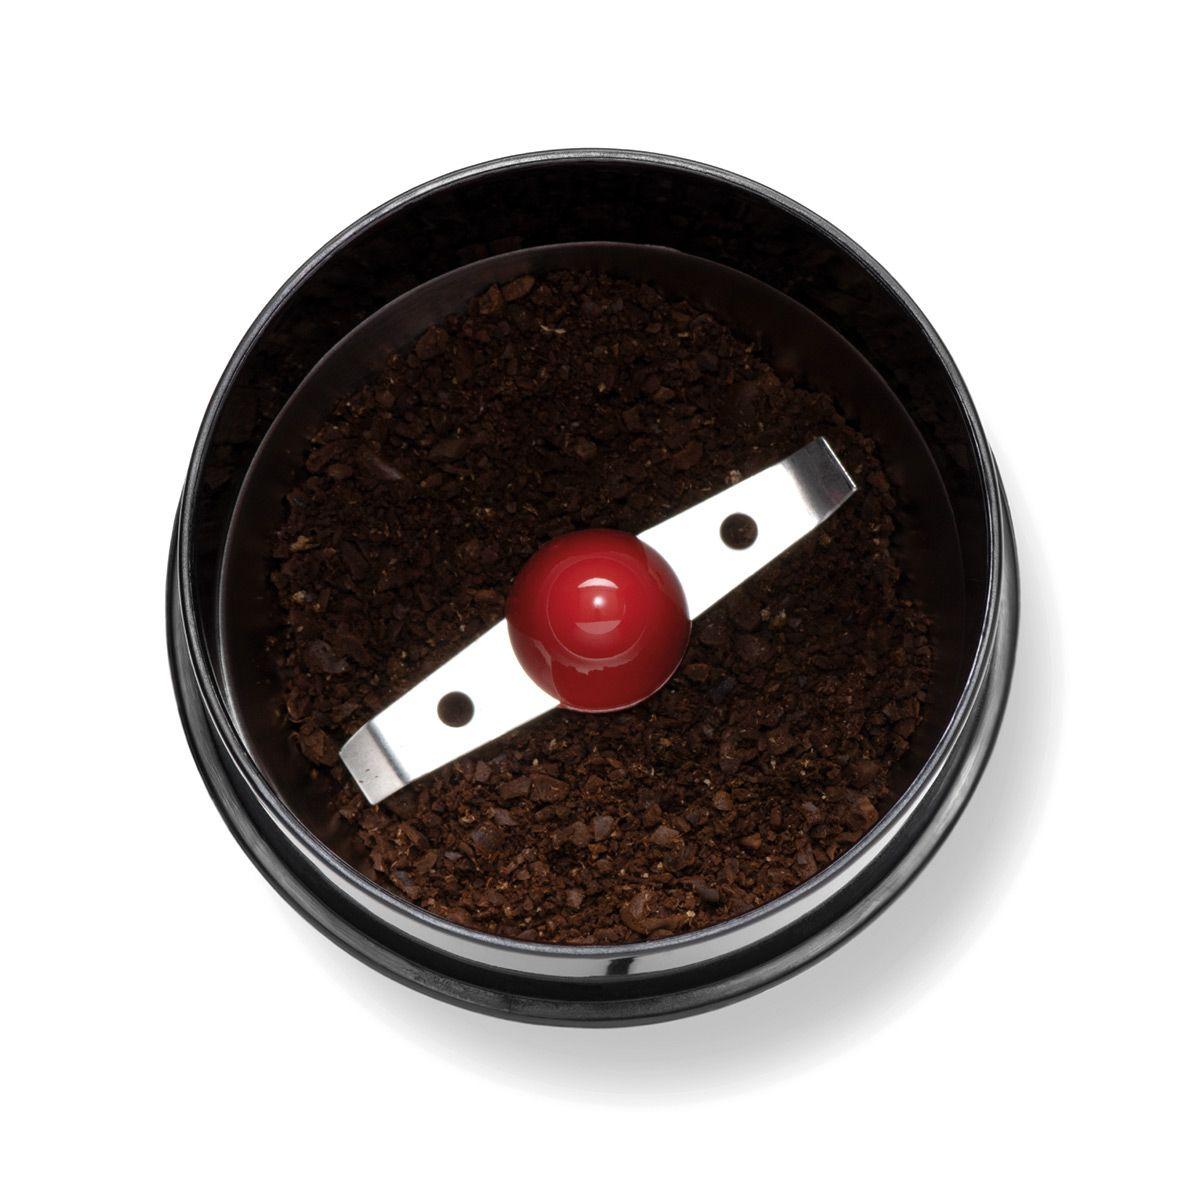 BODUM BISTRO Electric Coffee Grinder